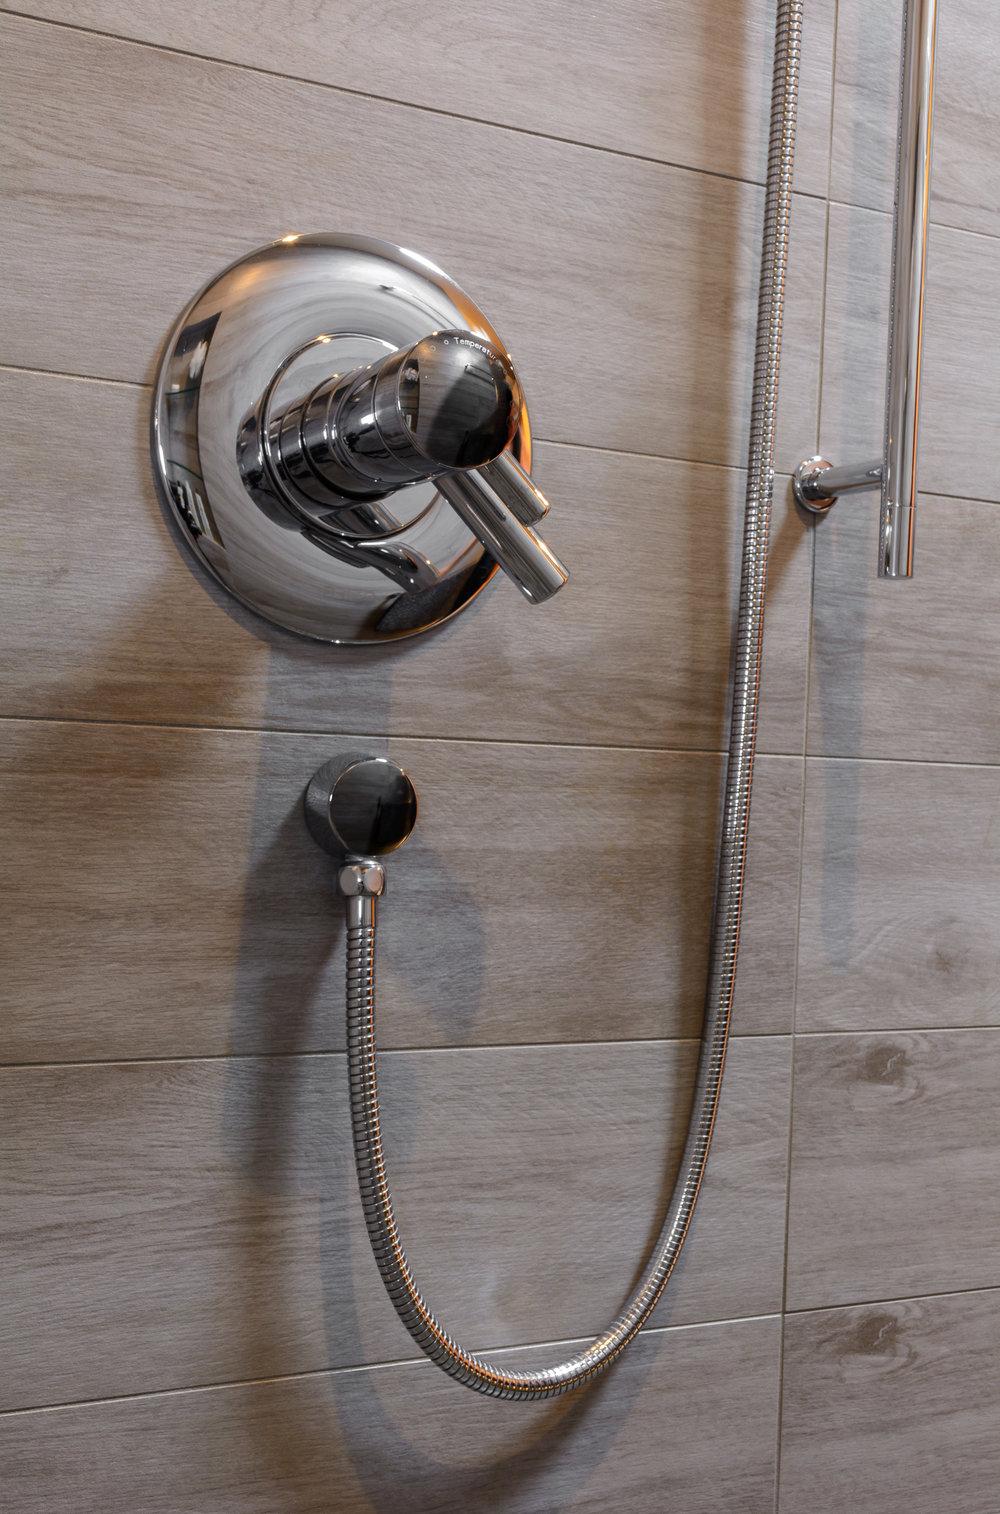 Modern shower valve with hand held fixture